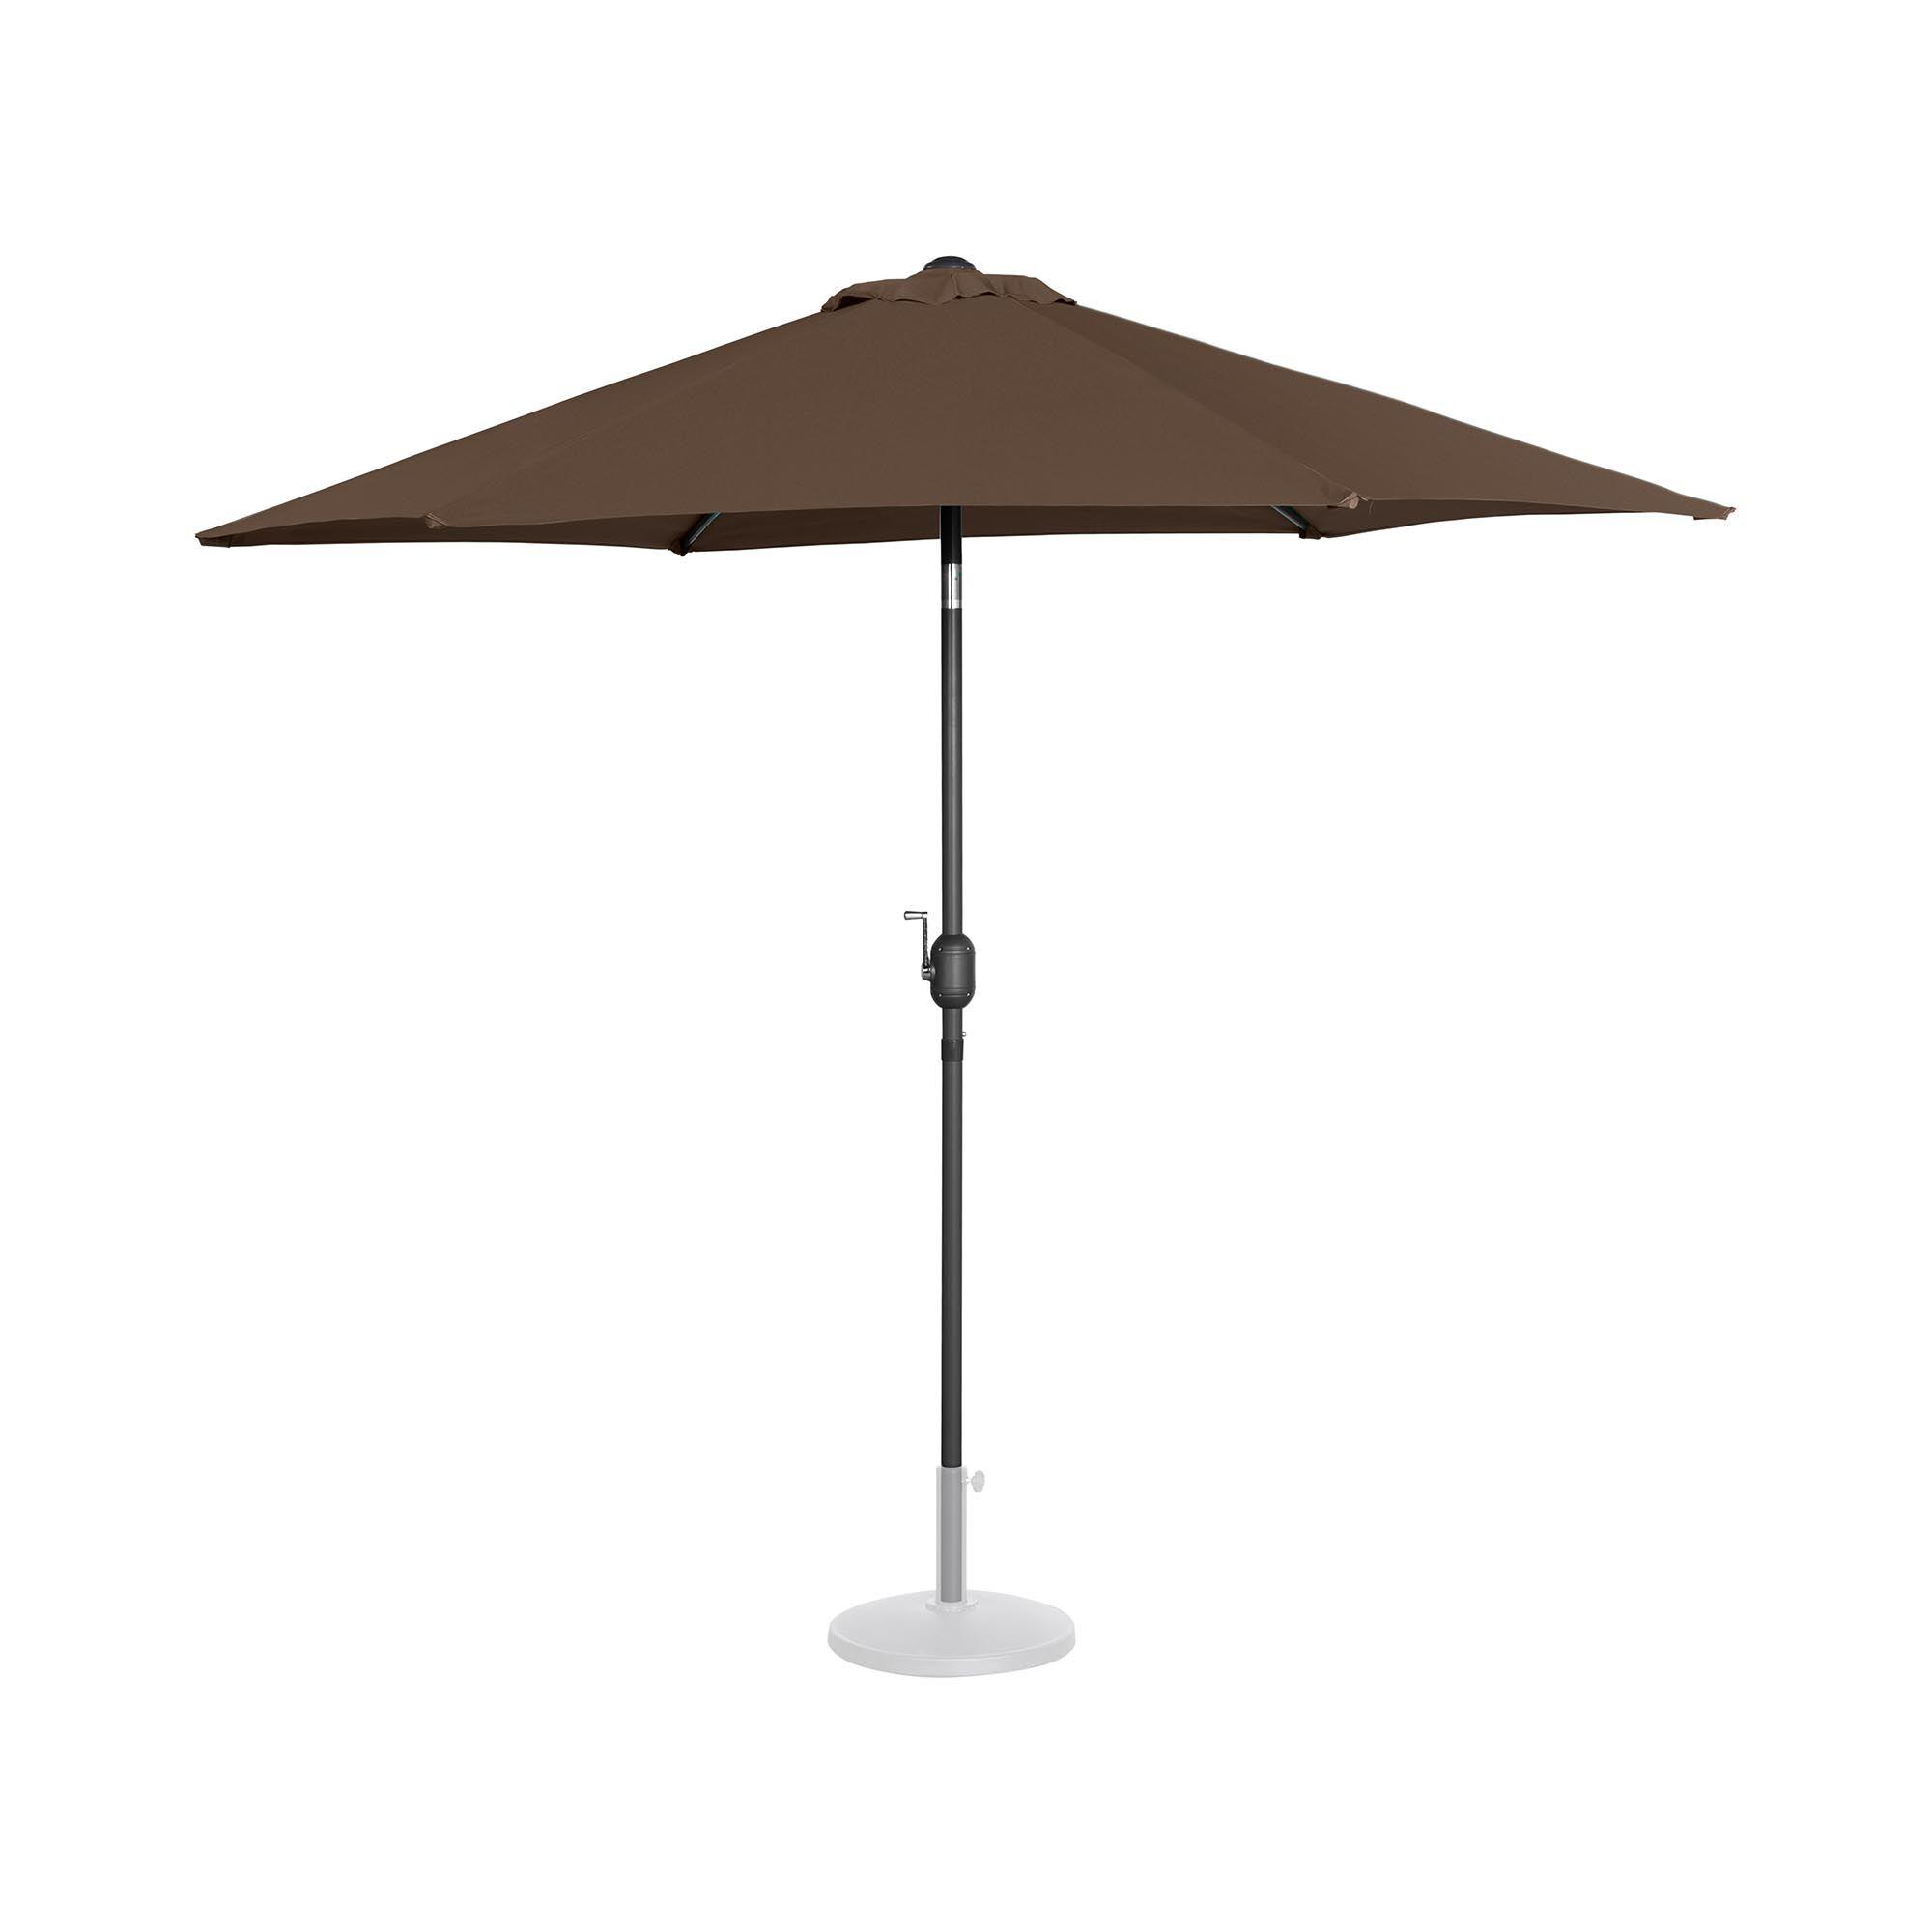 Uniprodo Stor parasoll - brun - sekskantet - Ø 270 cm - kan skråstilles 10250147